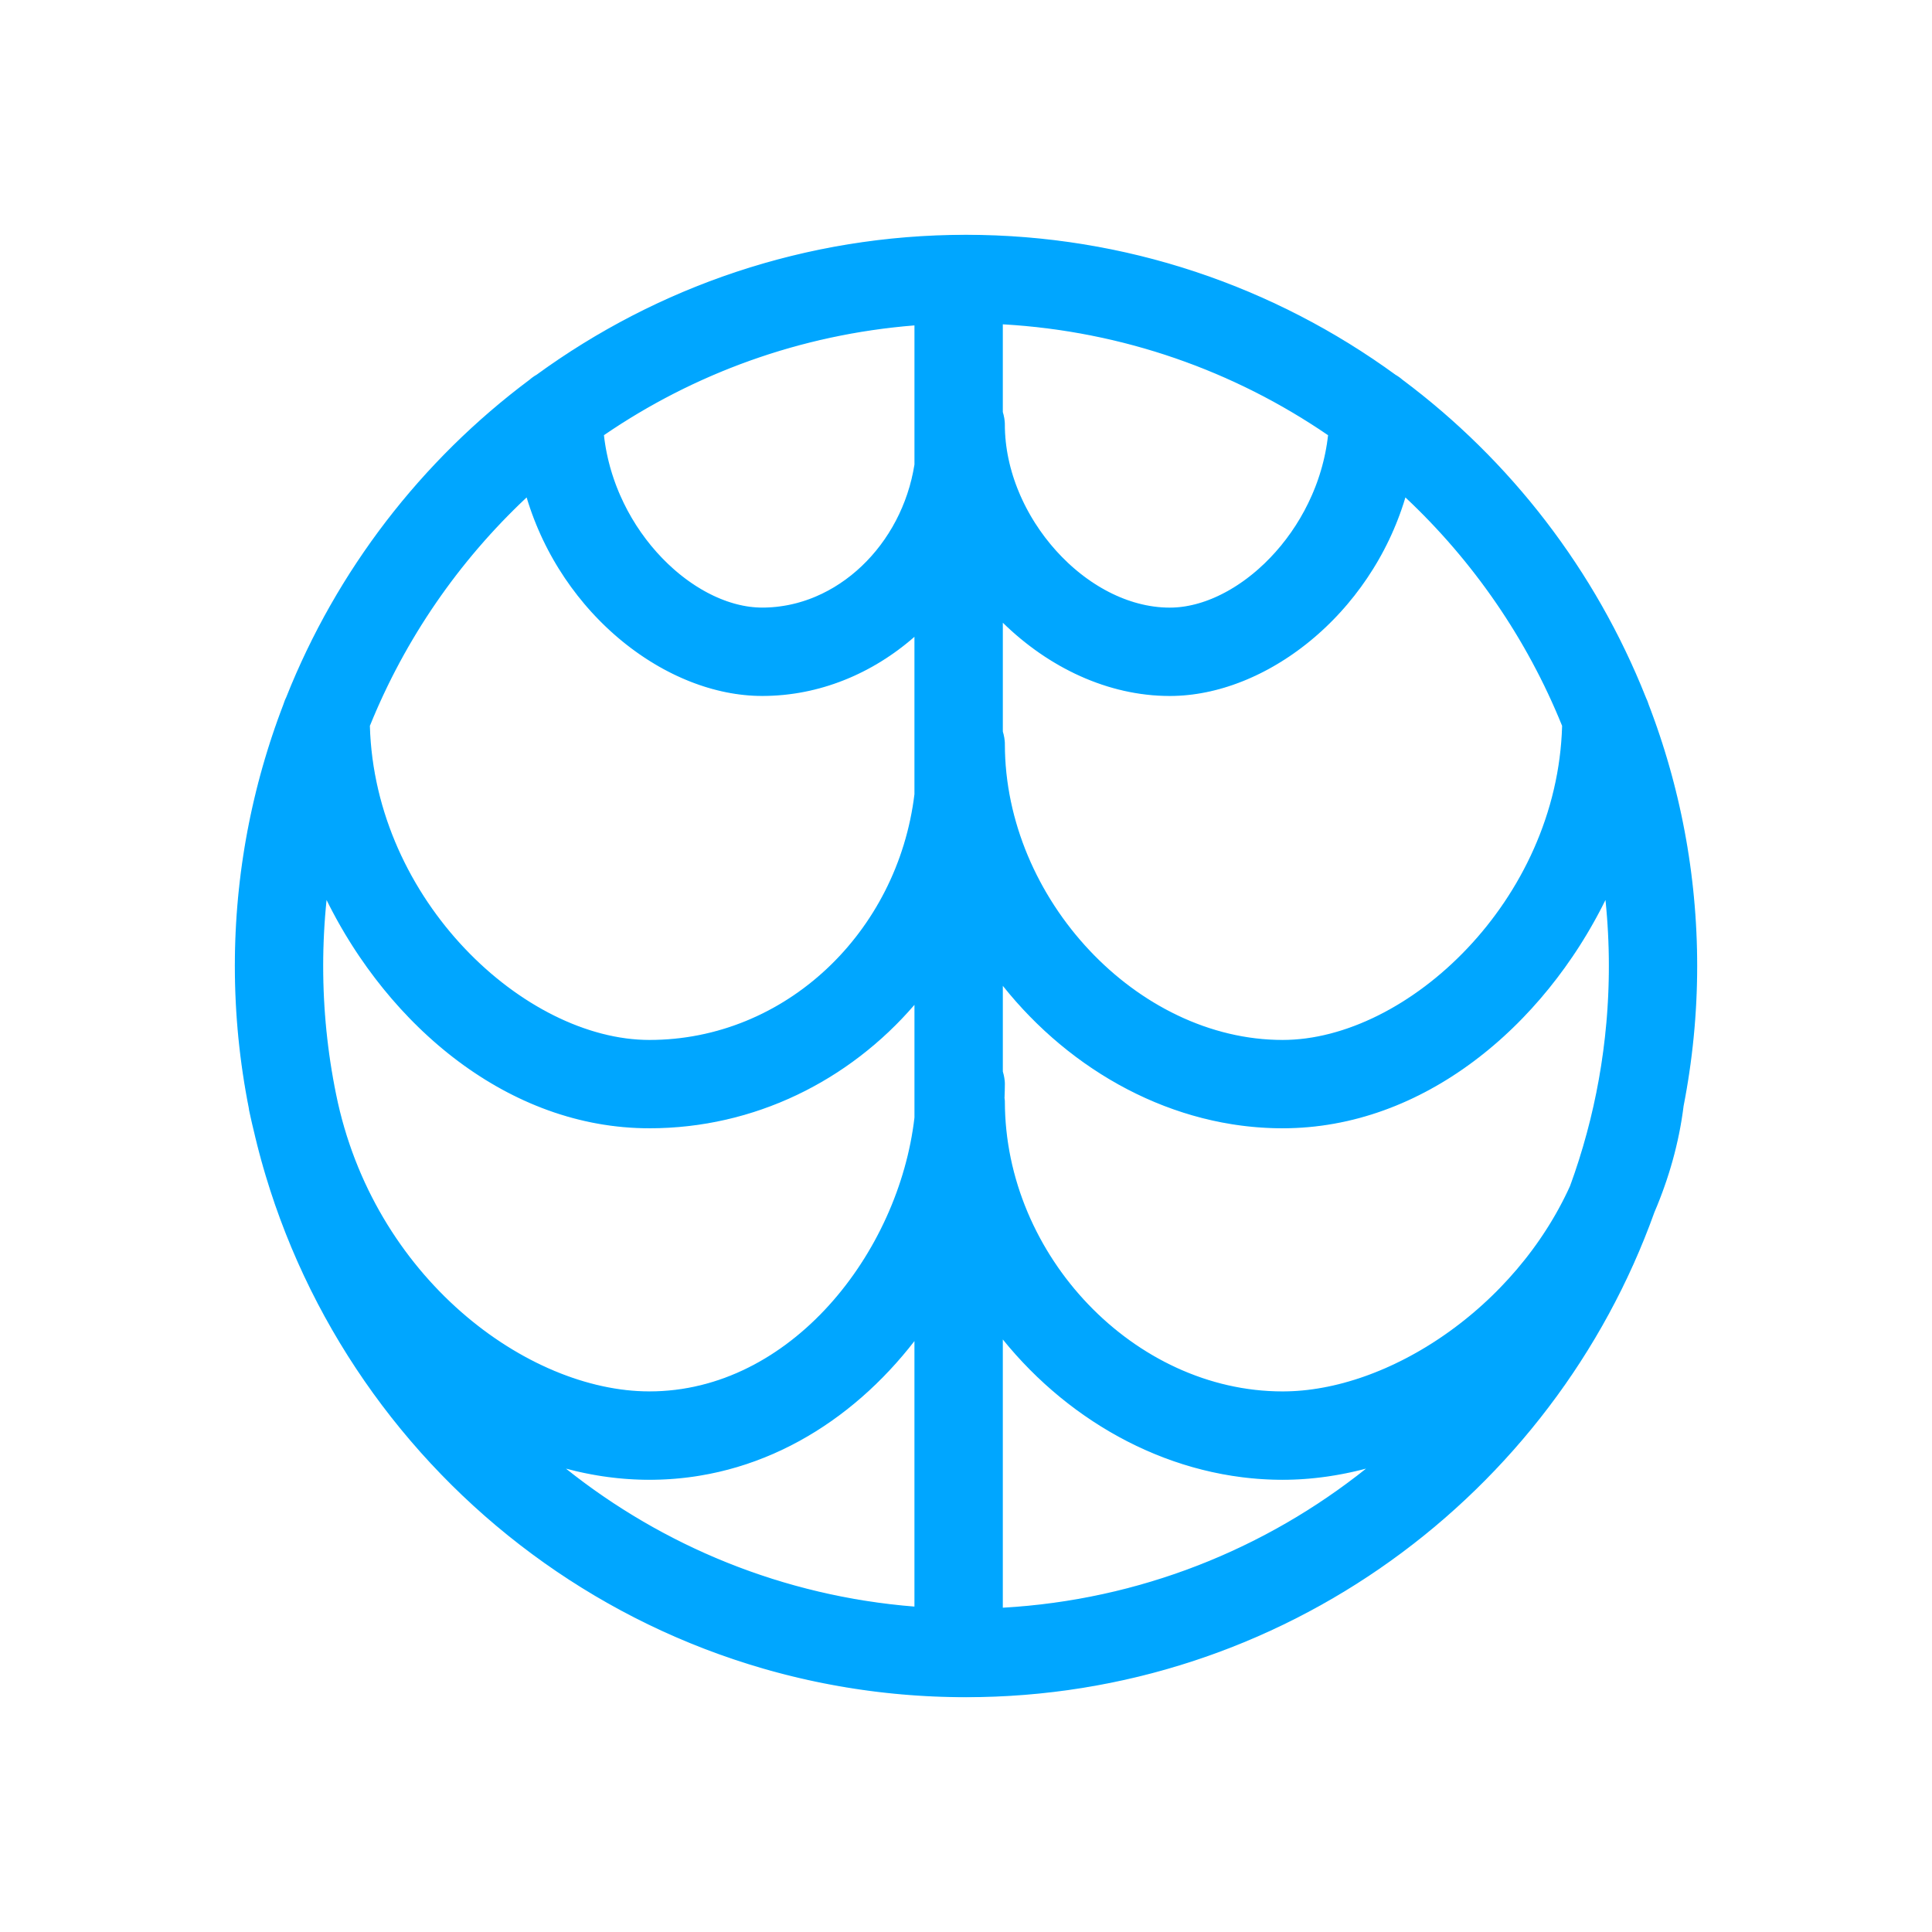 Instinctive-Cognition_Logo_Brain-icon_Gold-Trans-XL.png